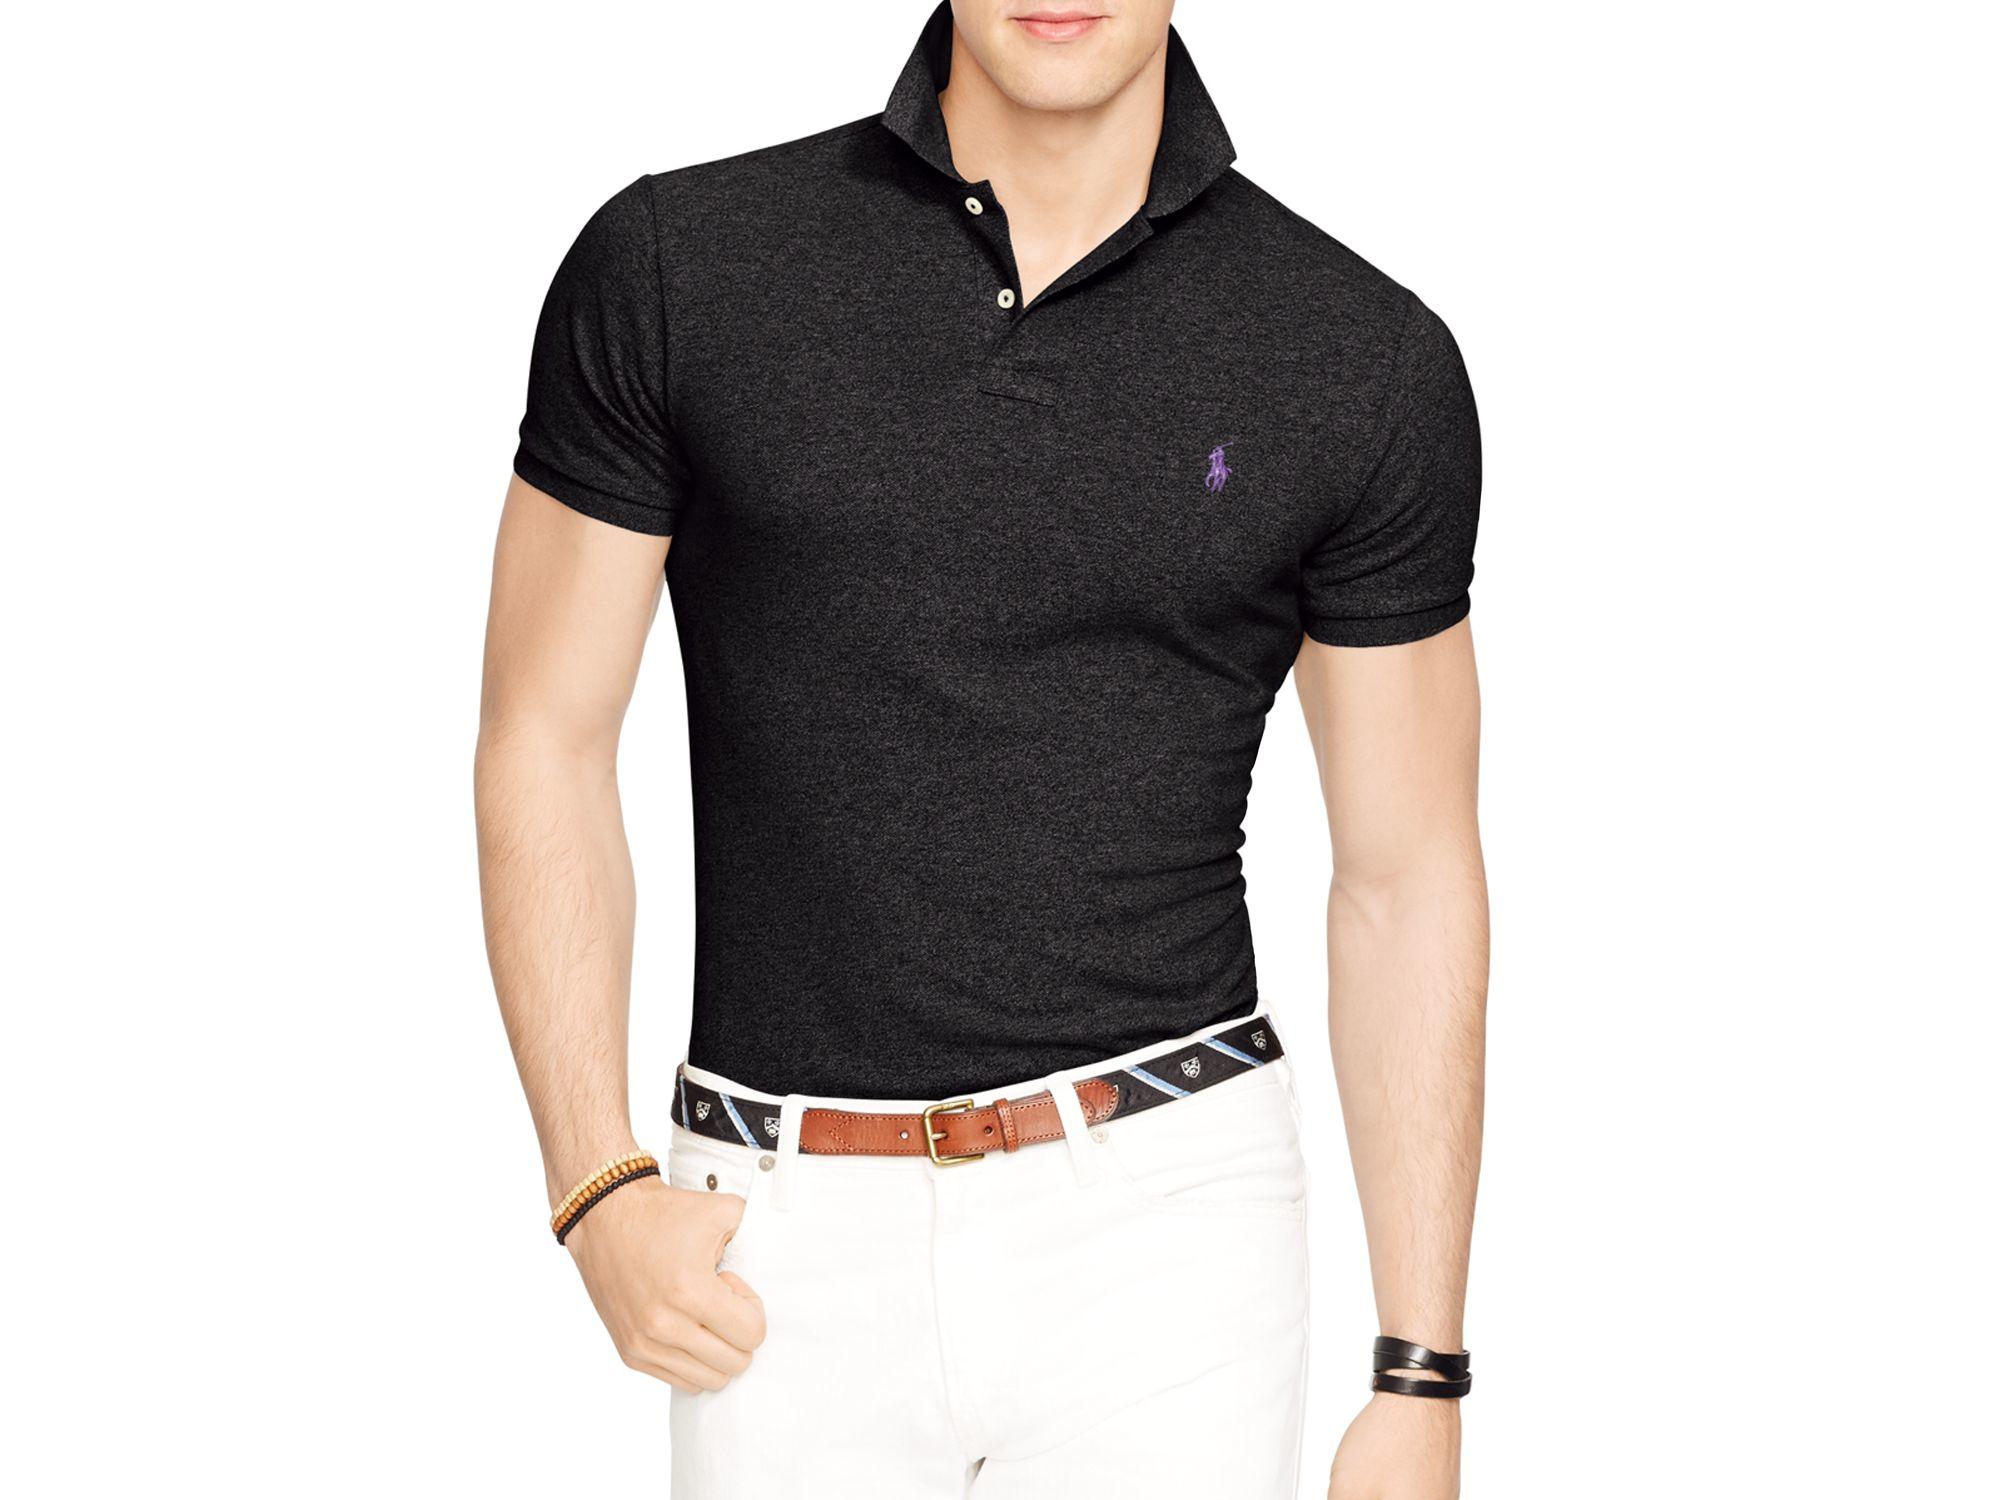 a740f3a330d84 ... greece lyst ralph lauren polo slim fit mesh polo shirt in black for men  1cb7c 8640e